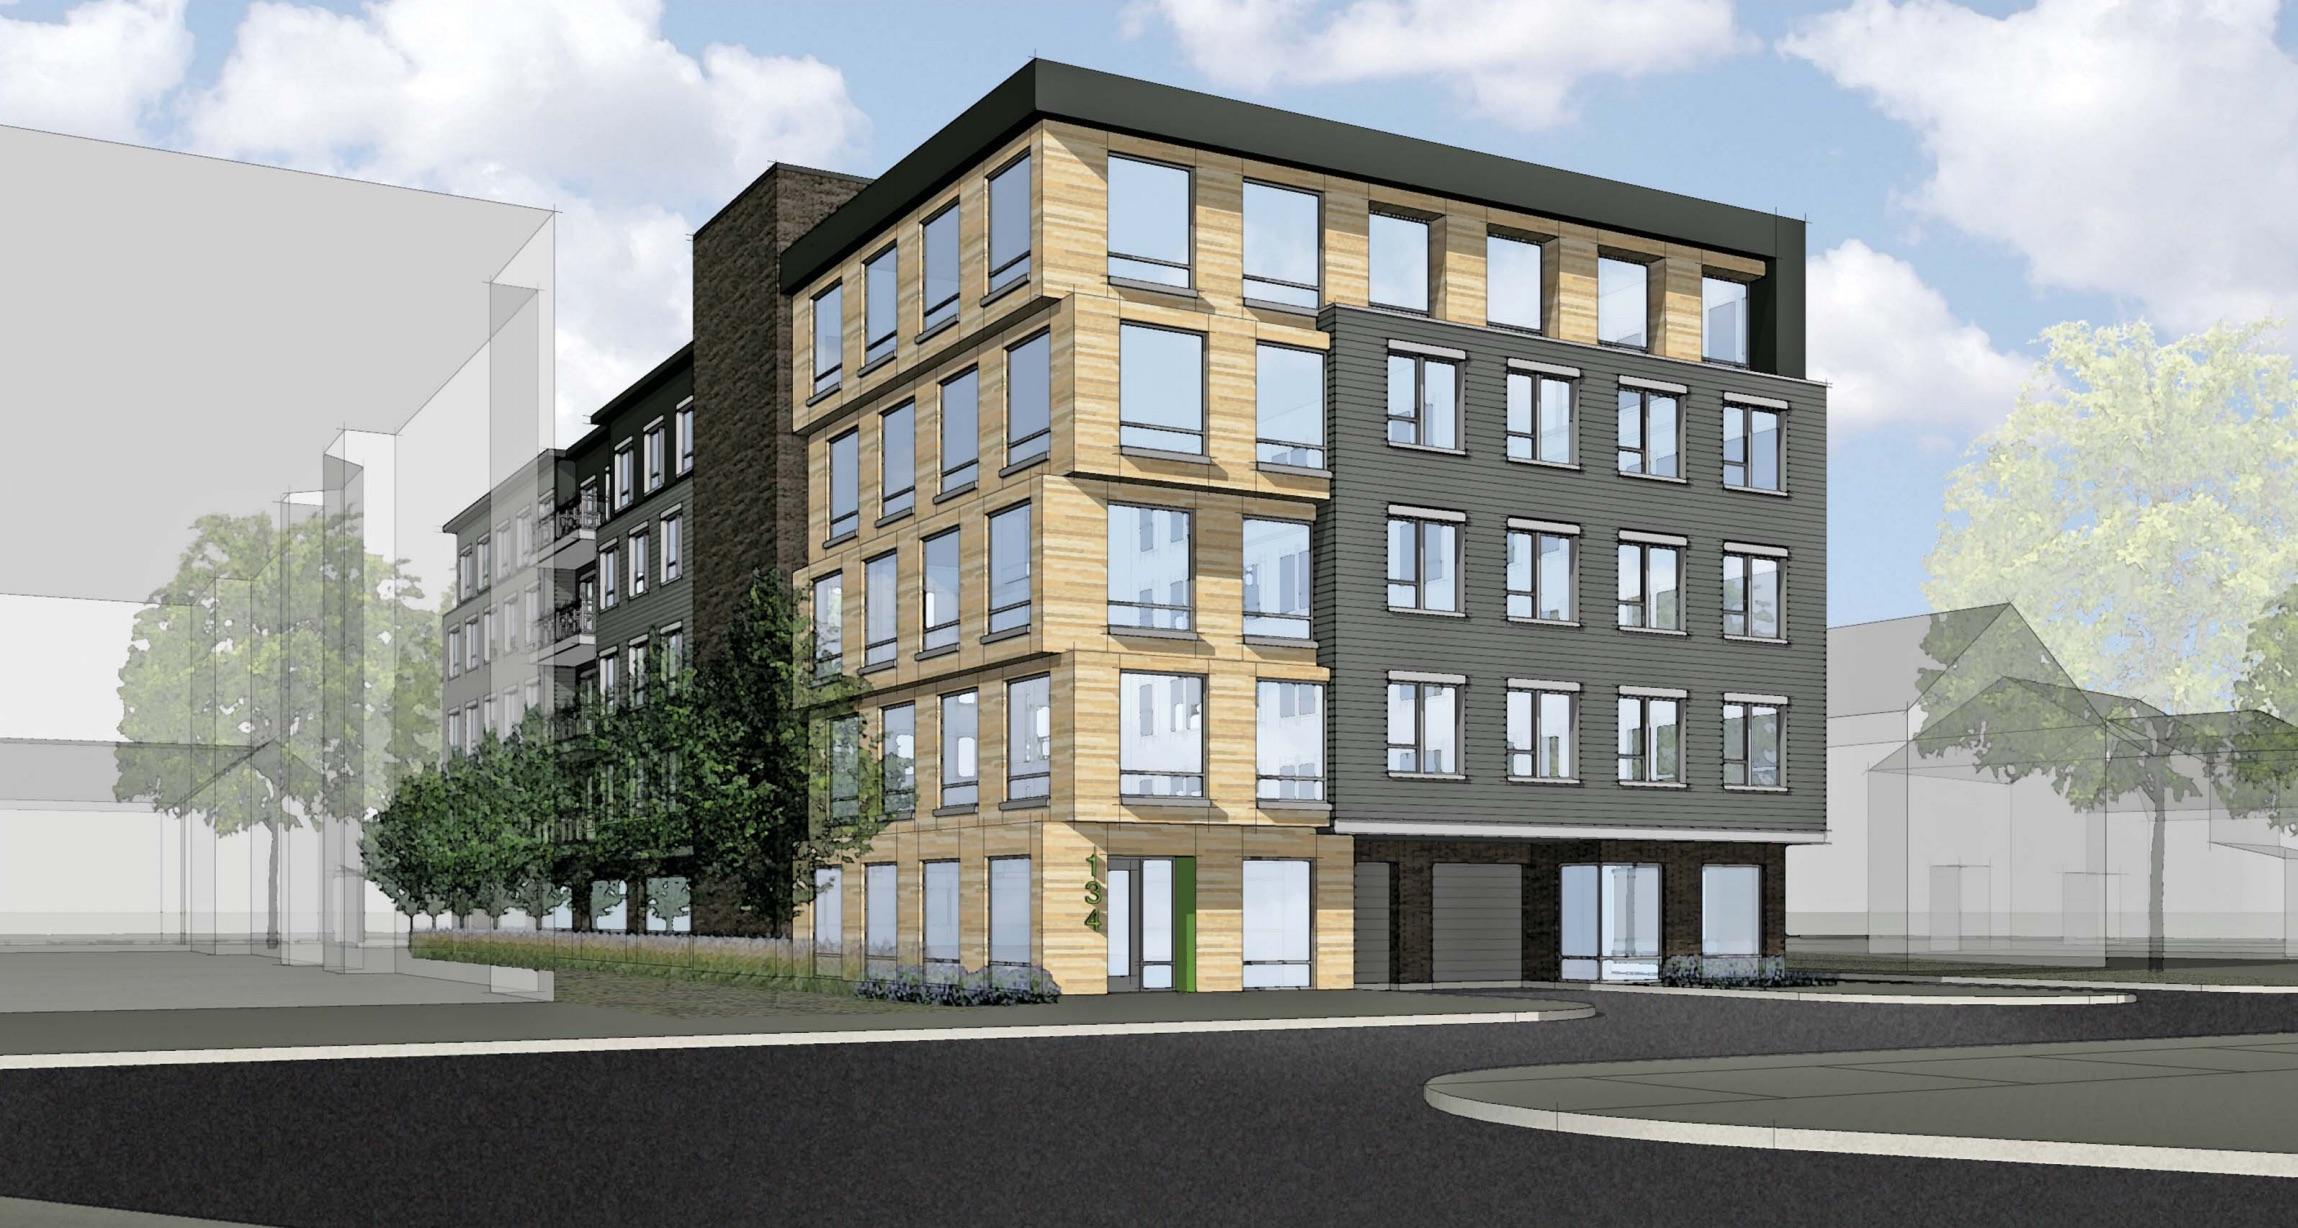 Babcock place 134 138 babcock street brookline proposed residential apartment development tremont asset management llc slater